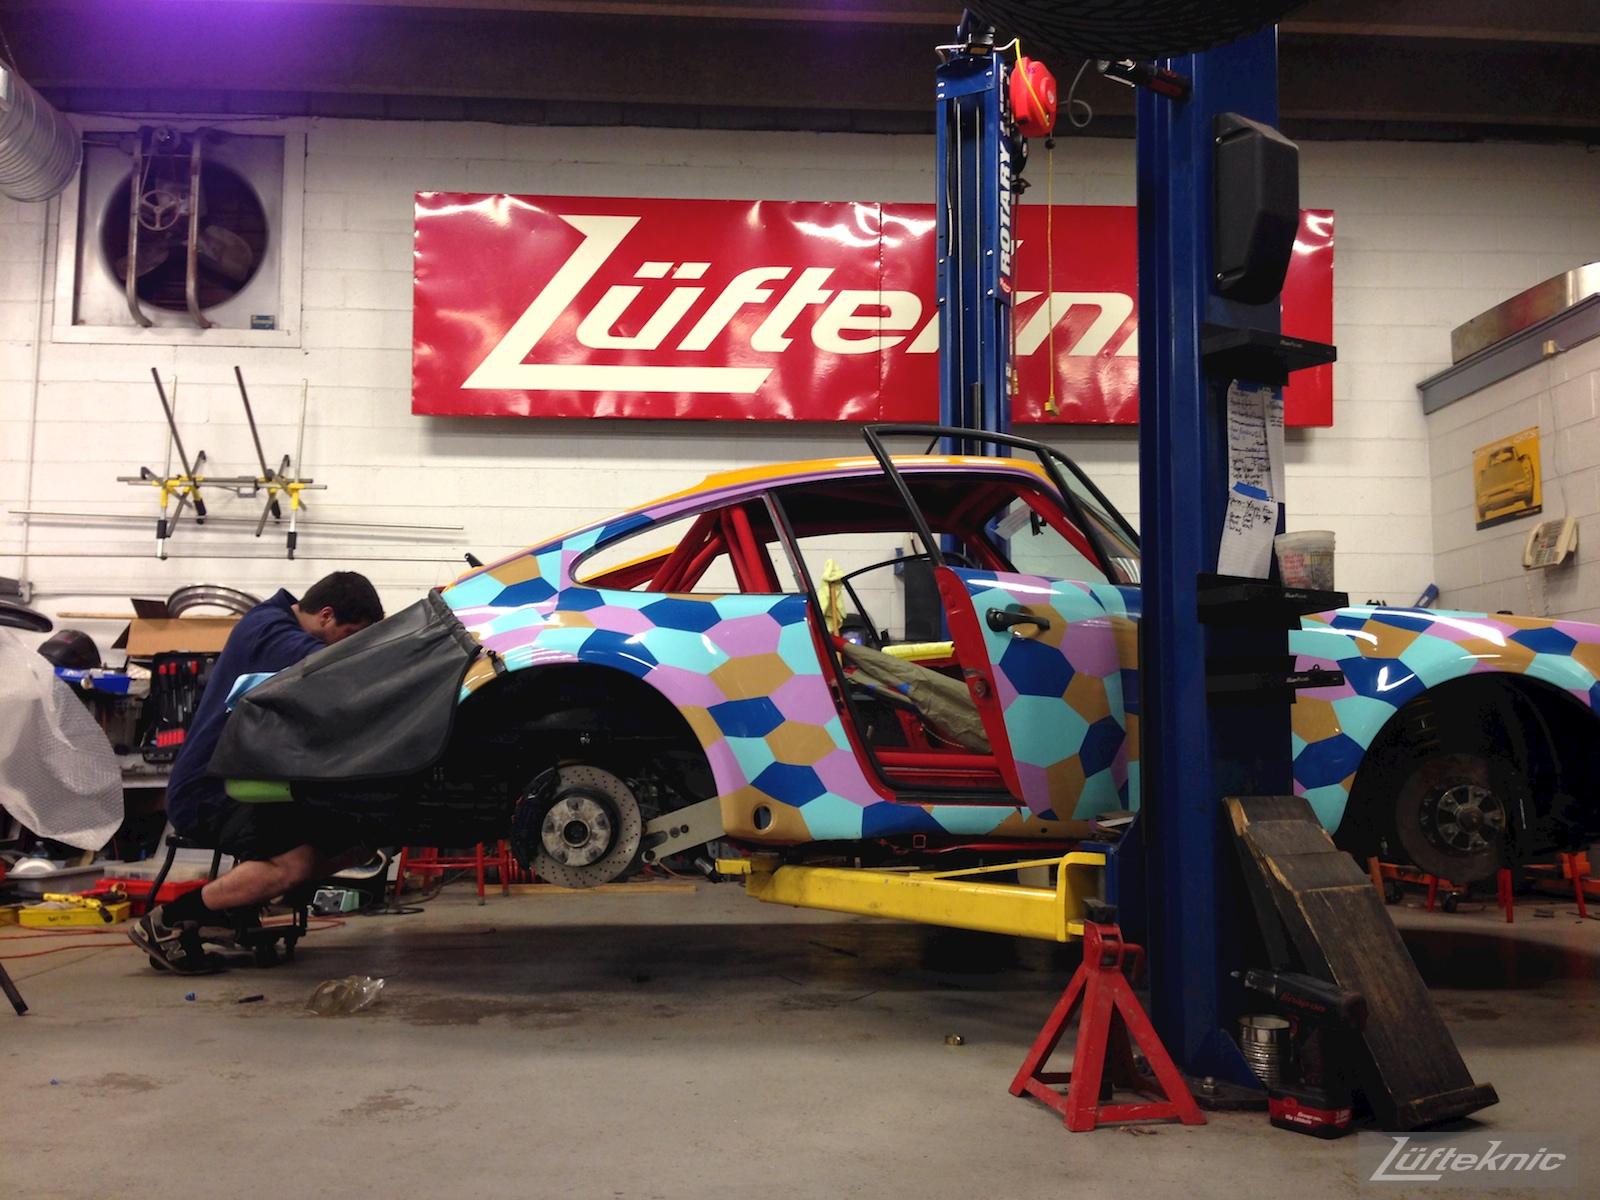 Lüfteknic #projectstuka Porsche 930 Turbo profile on the lift, with Lufteknic staff working on the engine